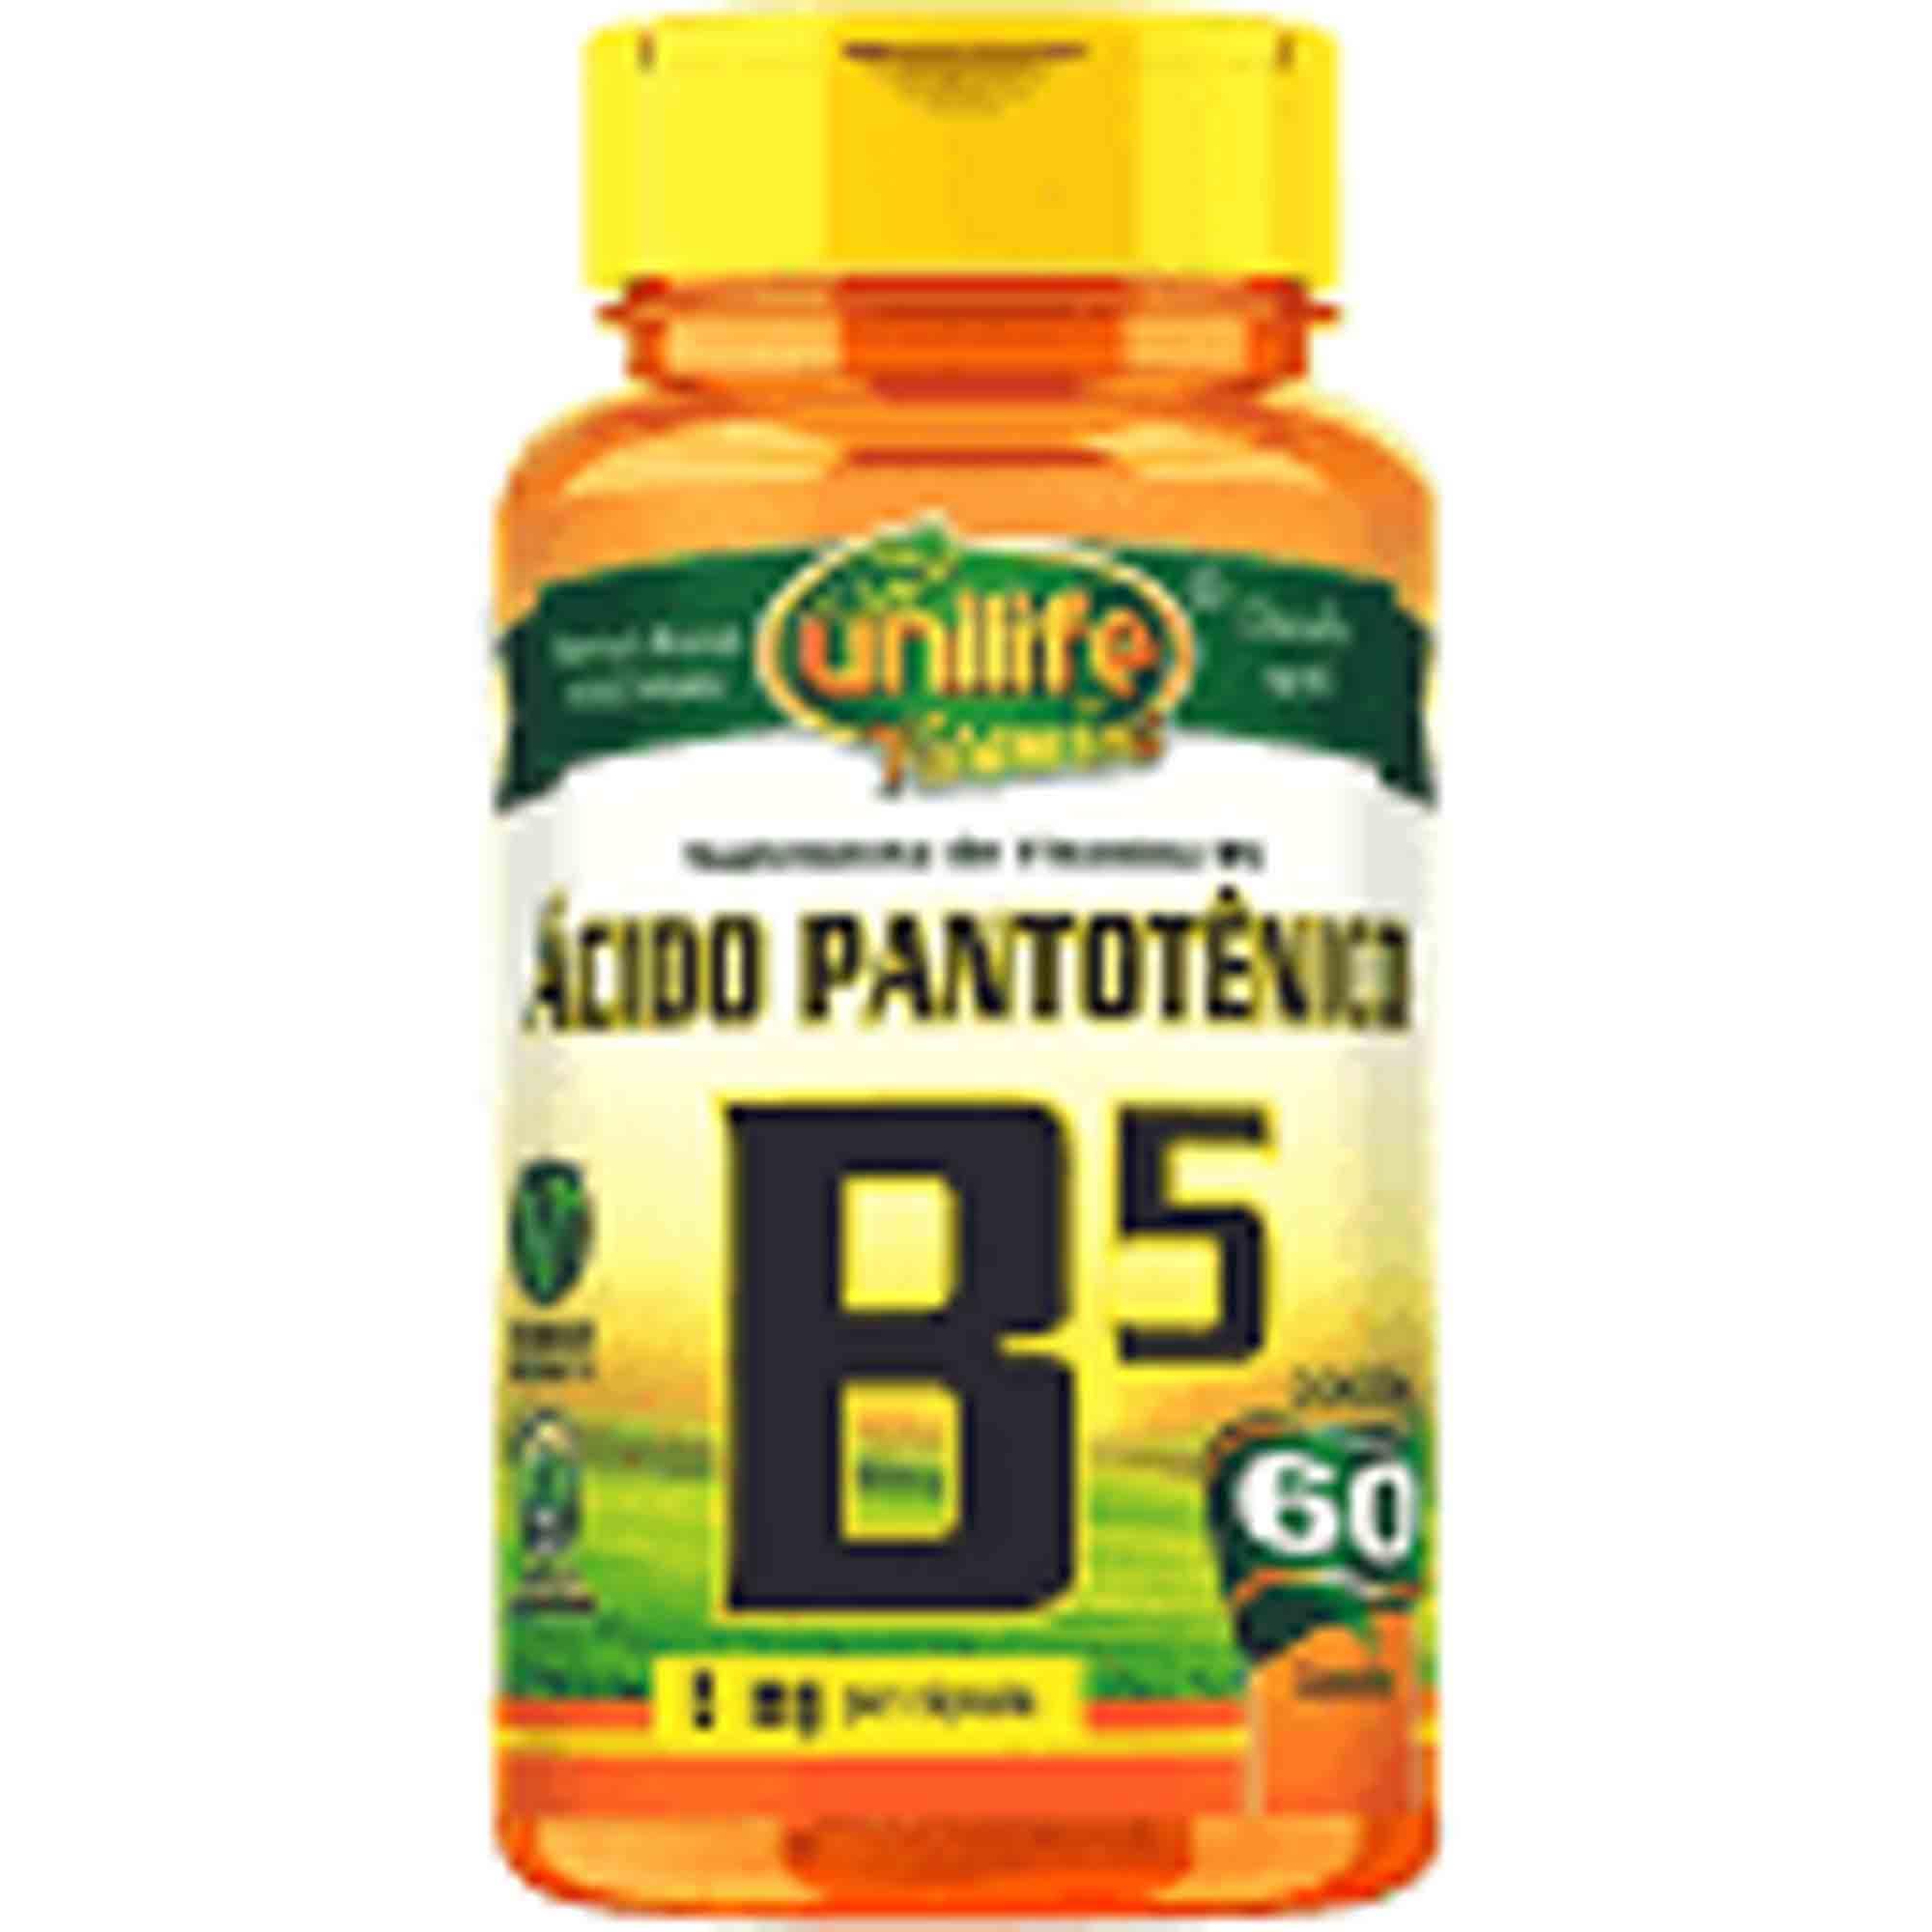 UNI VITAMINA B5 - ACIDO PANTOTENICO - 60 CAPS